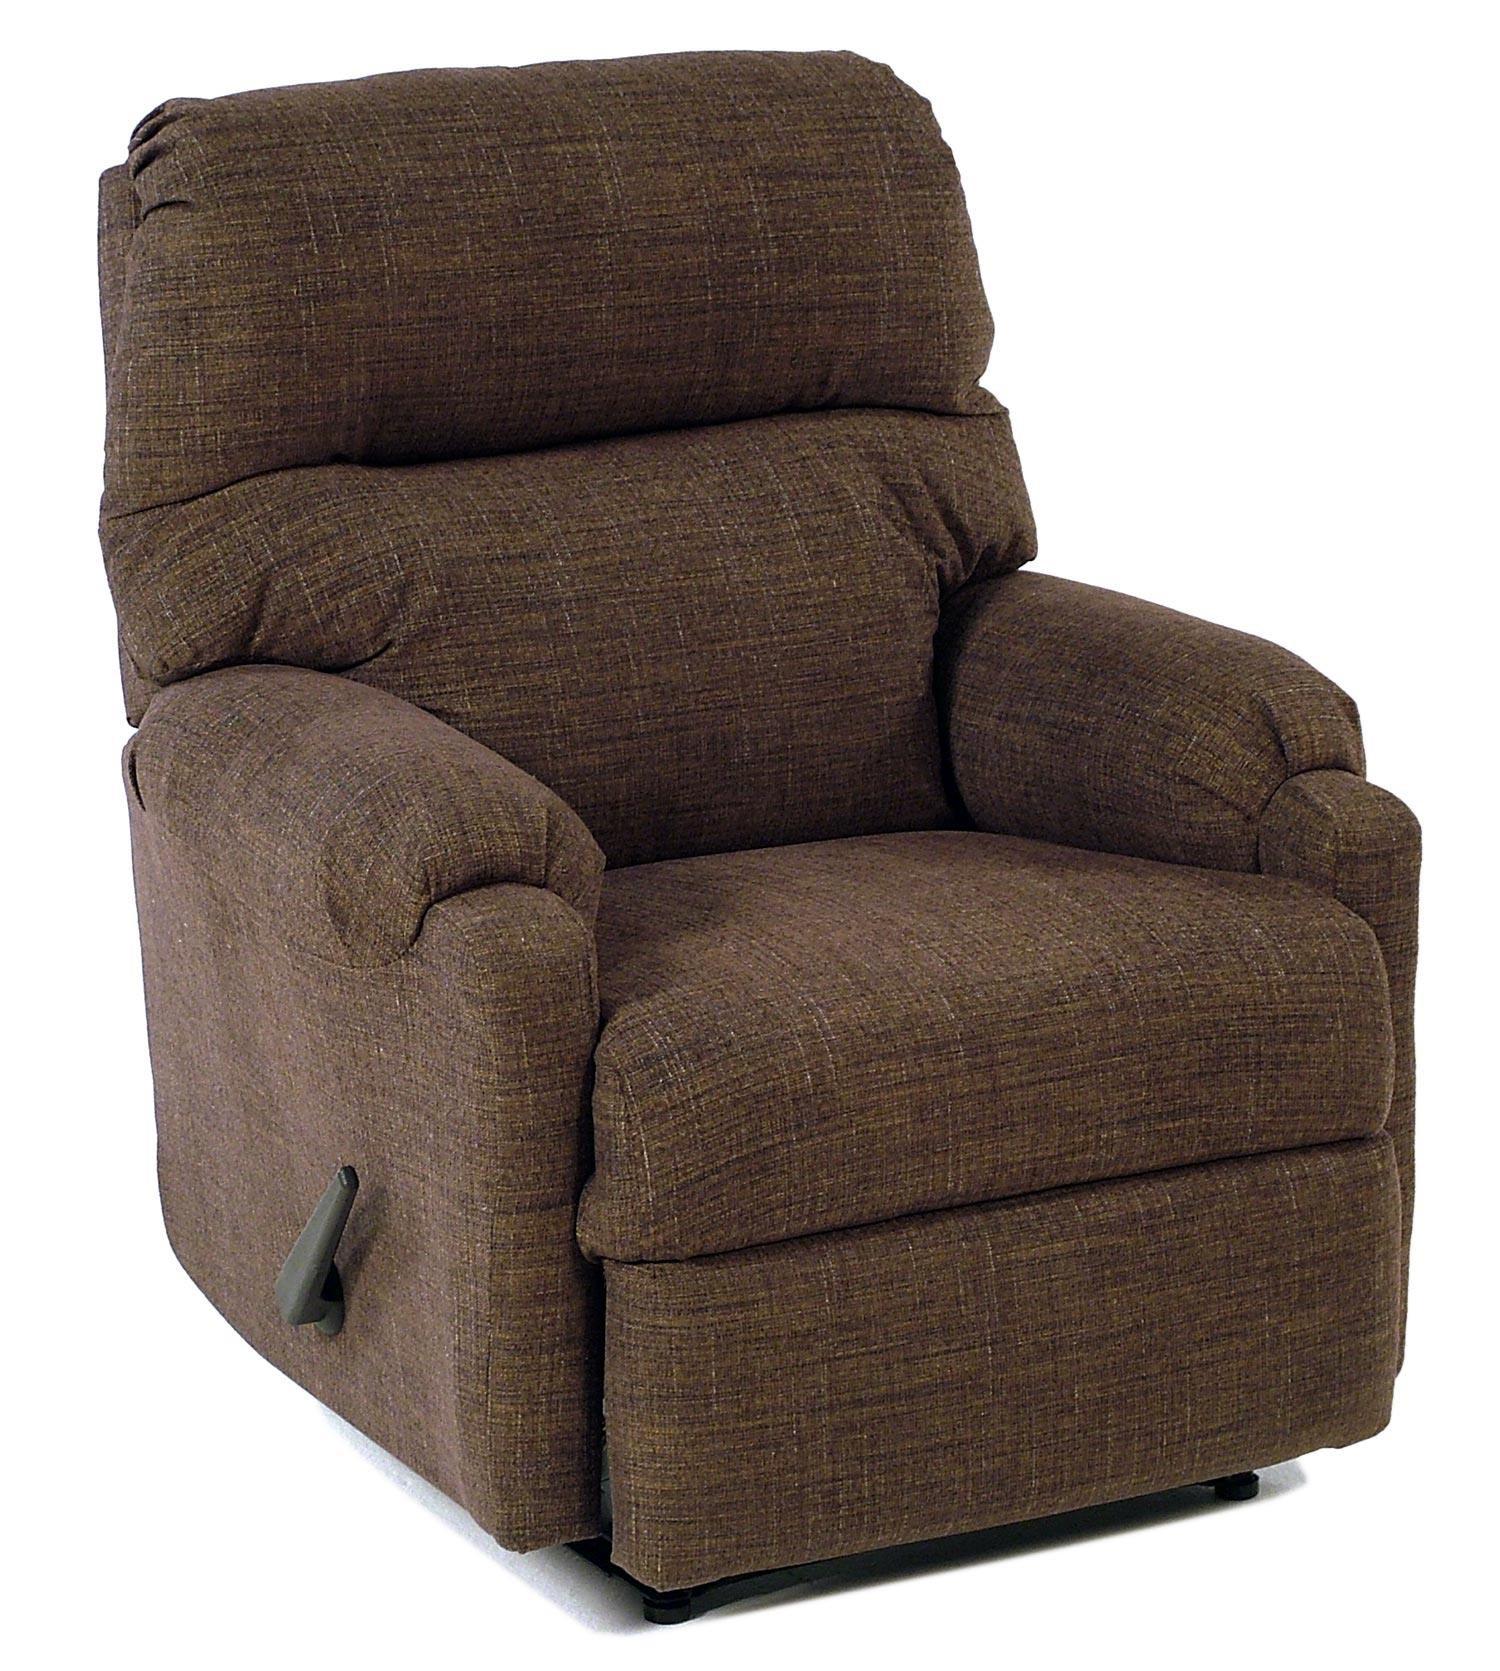 Best Home Furnishings JJ Wallhugger Recliner - Item Number: 1AW34-21616CH